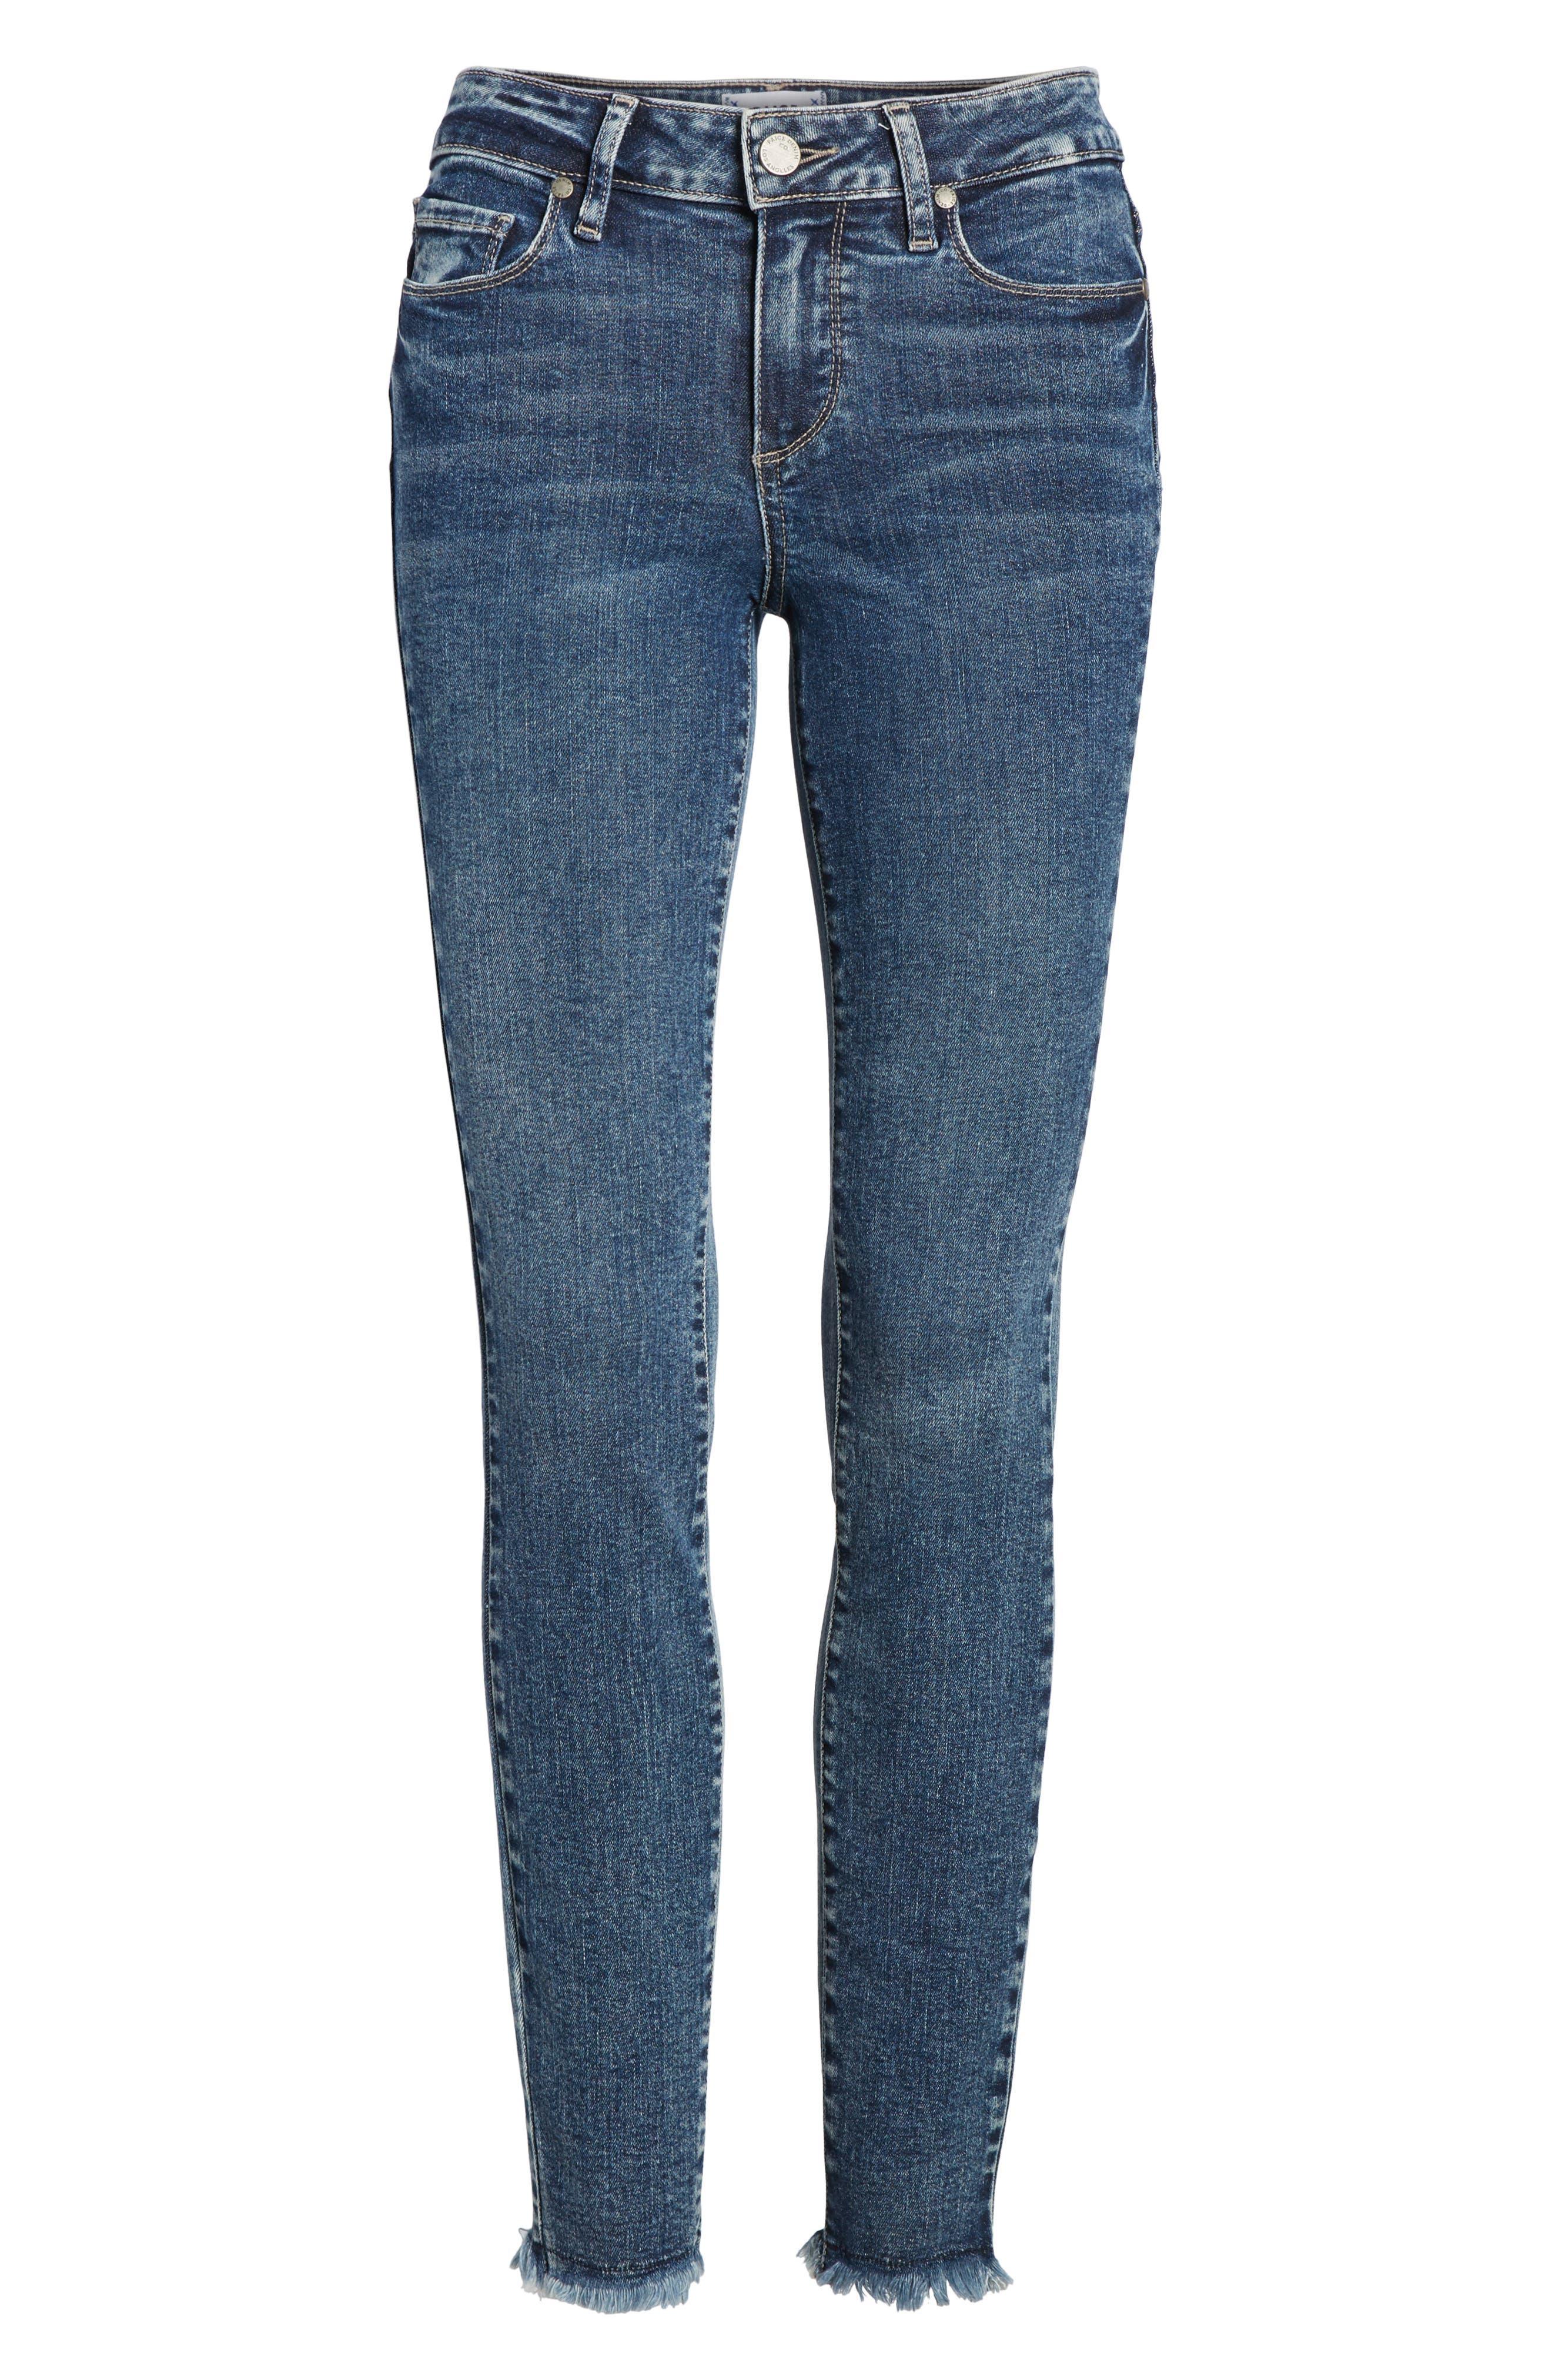 Transcend Vintage - Verdugo Ultra Skinny Jeans,                             Alternate thumbnail 7, color,                             400